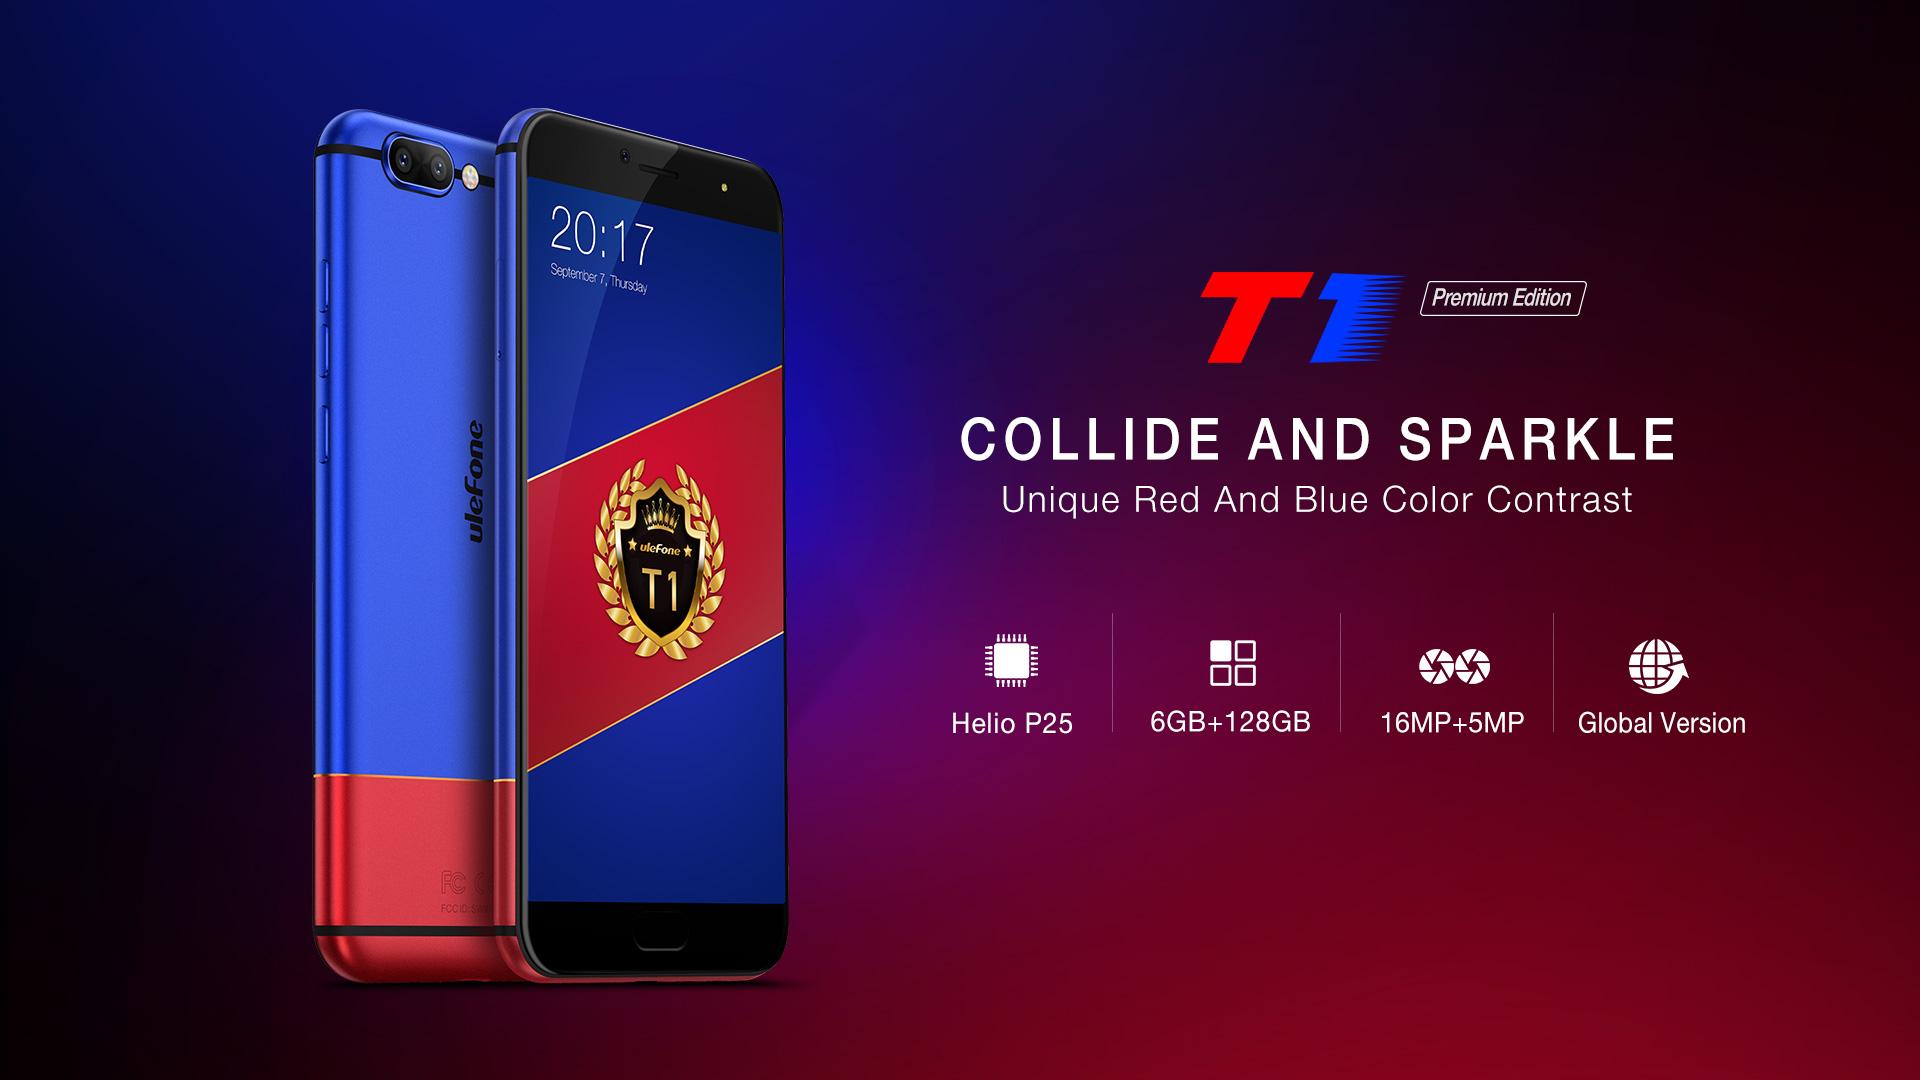 Ulefone T1, Premium Edition